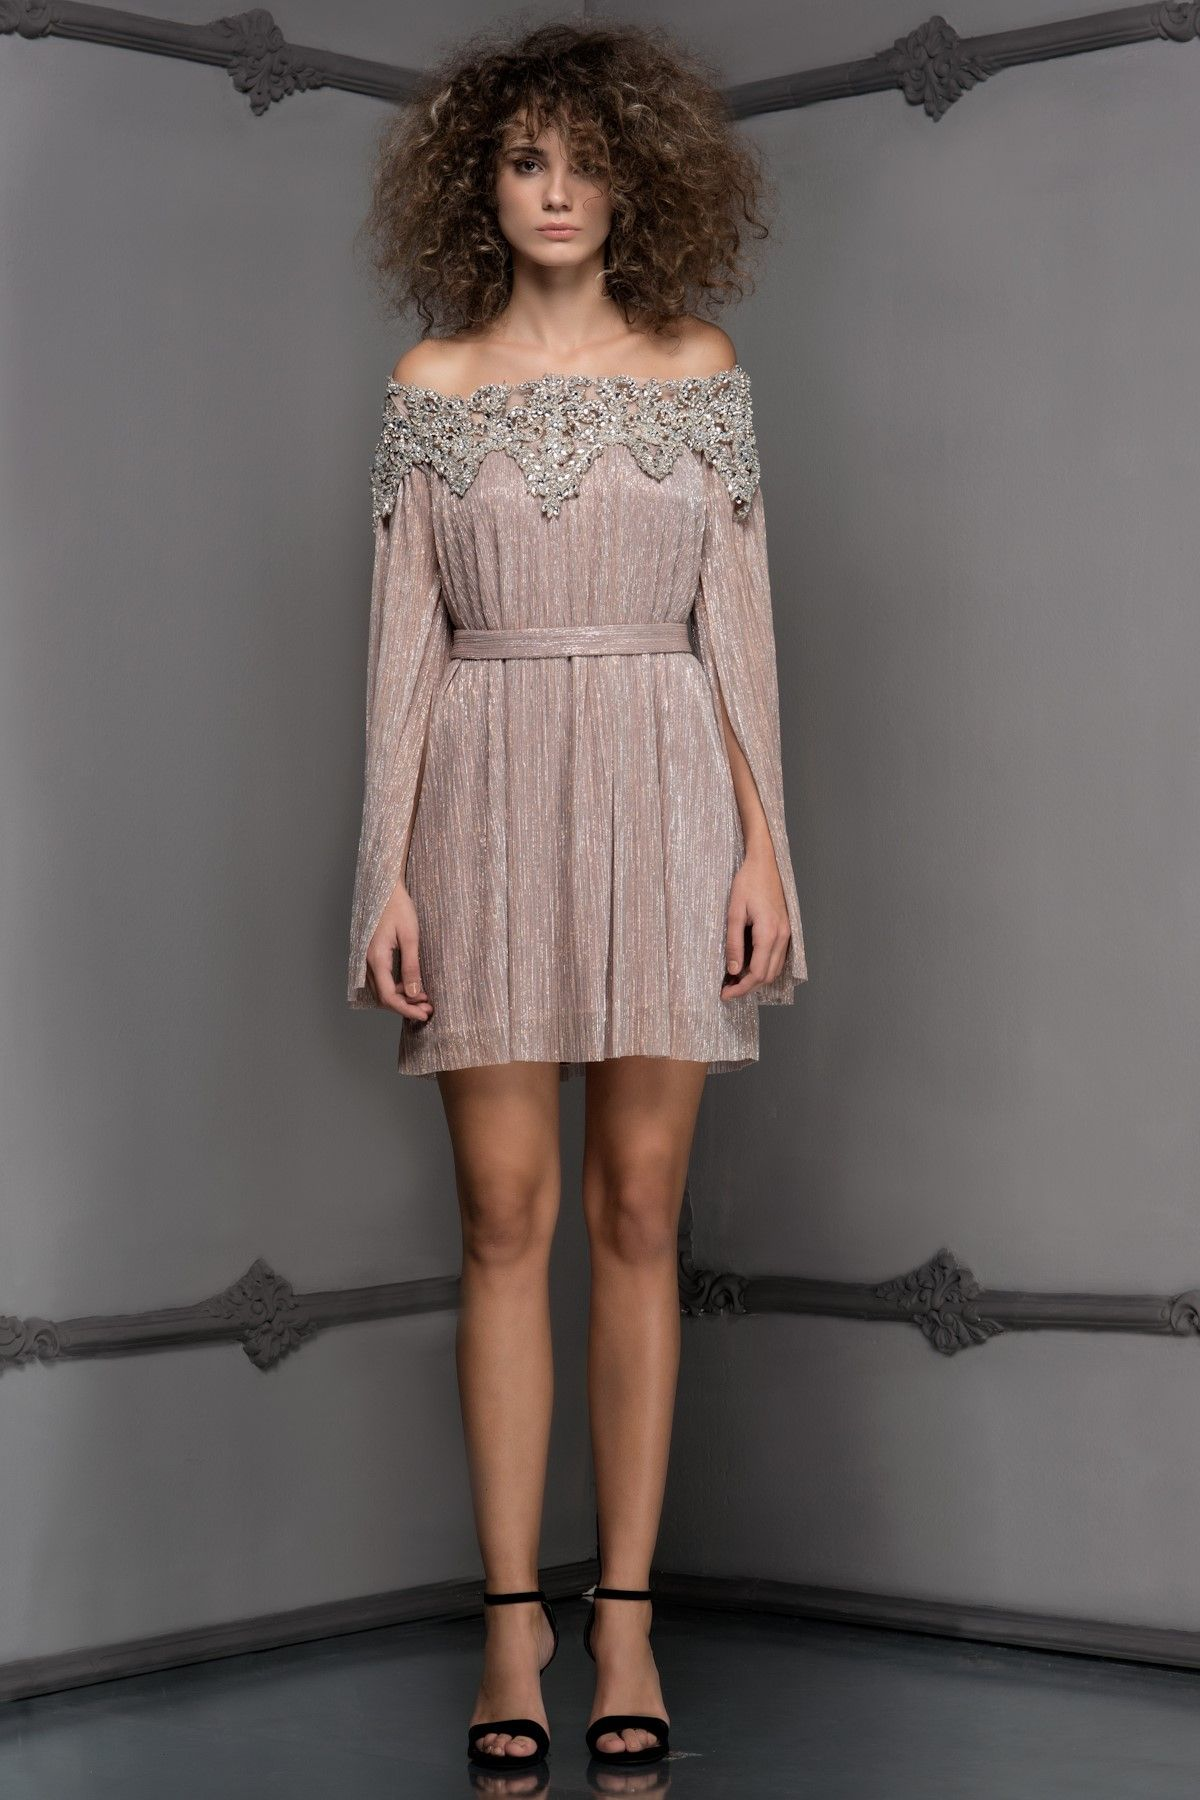 Chloe Pudra Elbise Mlwaw17fn7000 Raisa Amp Vanessa For Trendyol Trendyol Elbise Quinceanera Dresses Kiz Cocugu Modasi